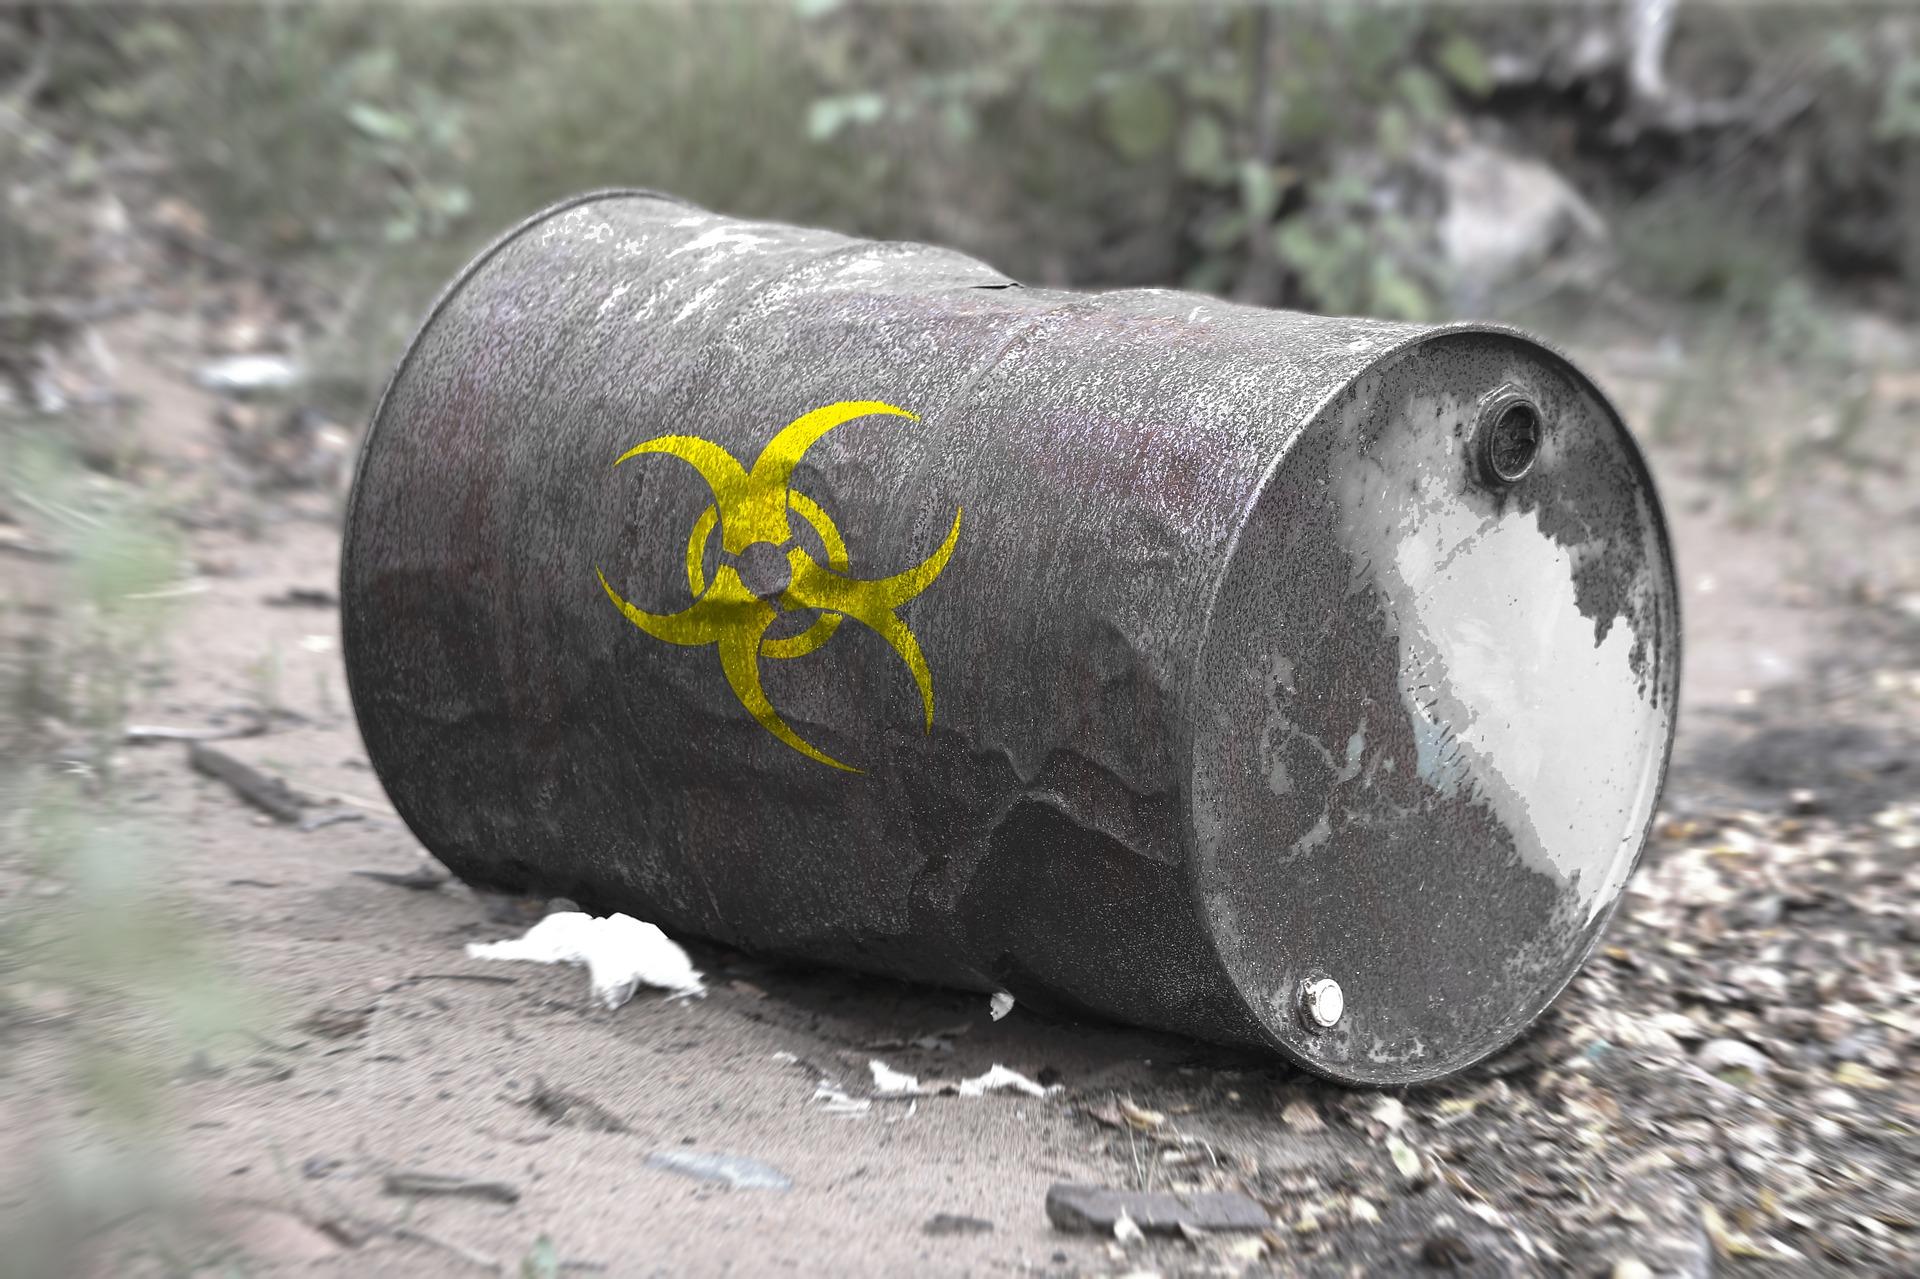 97-toxic-waste-2089779_1920_biosecurite